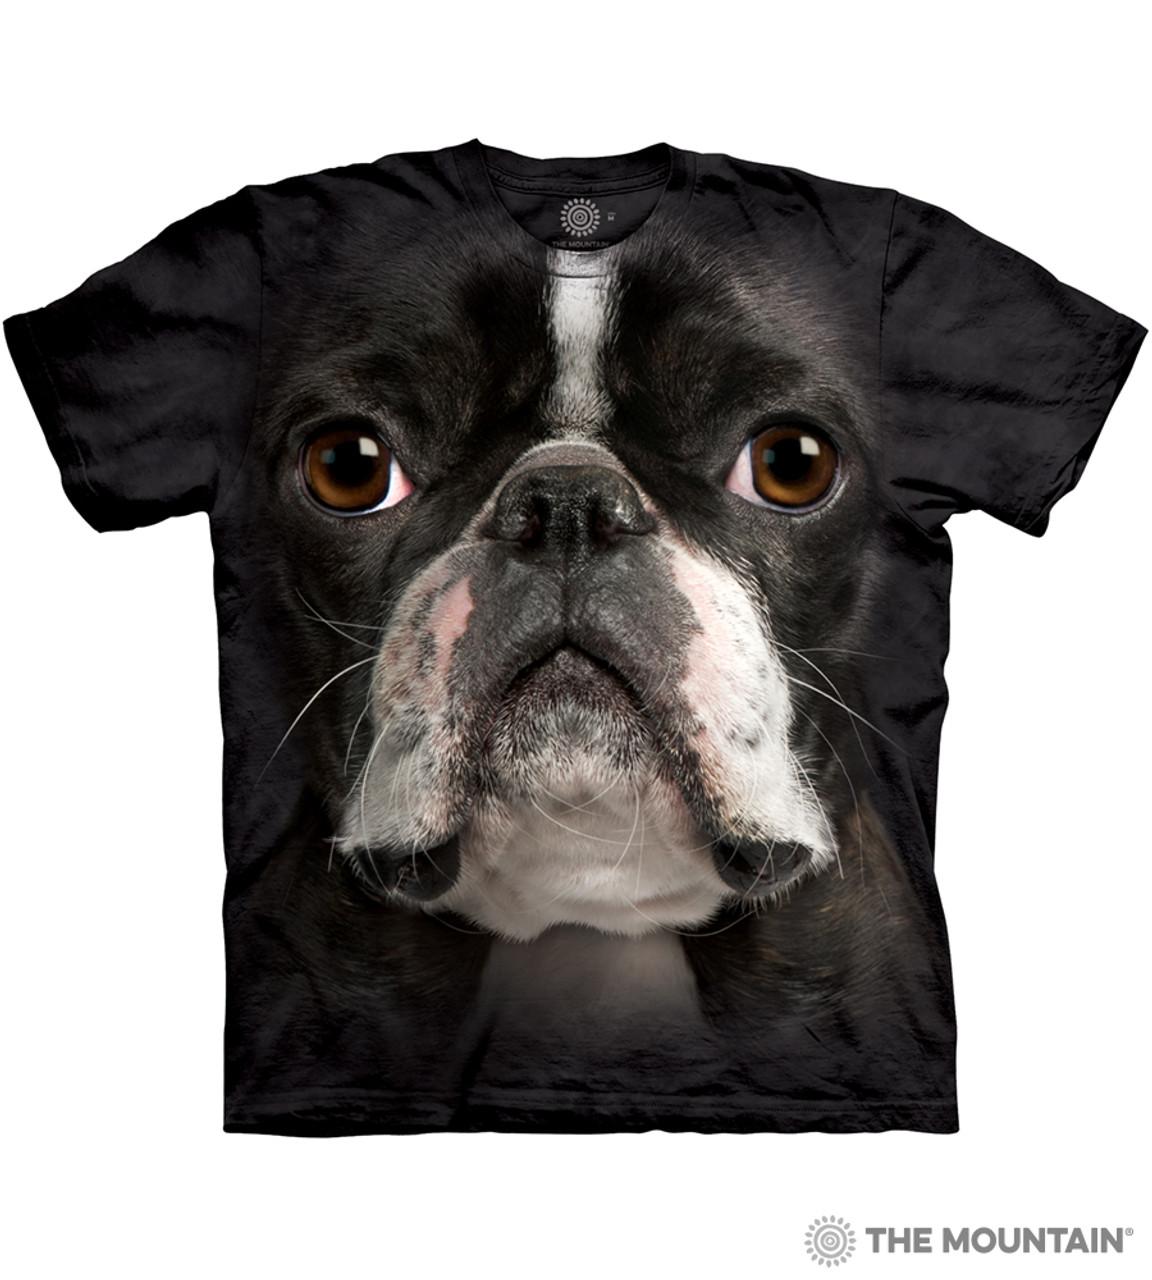 The Mountain Adult Unisex T Shirt Boston Terrier Face